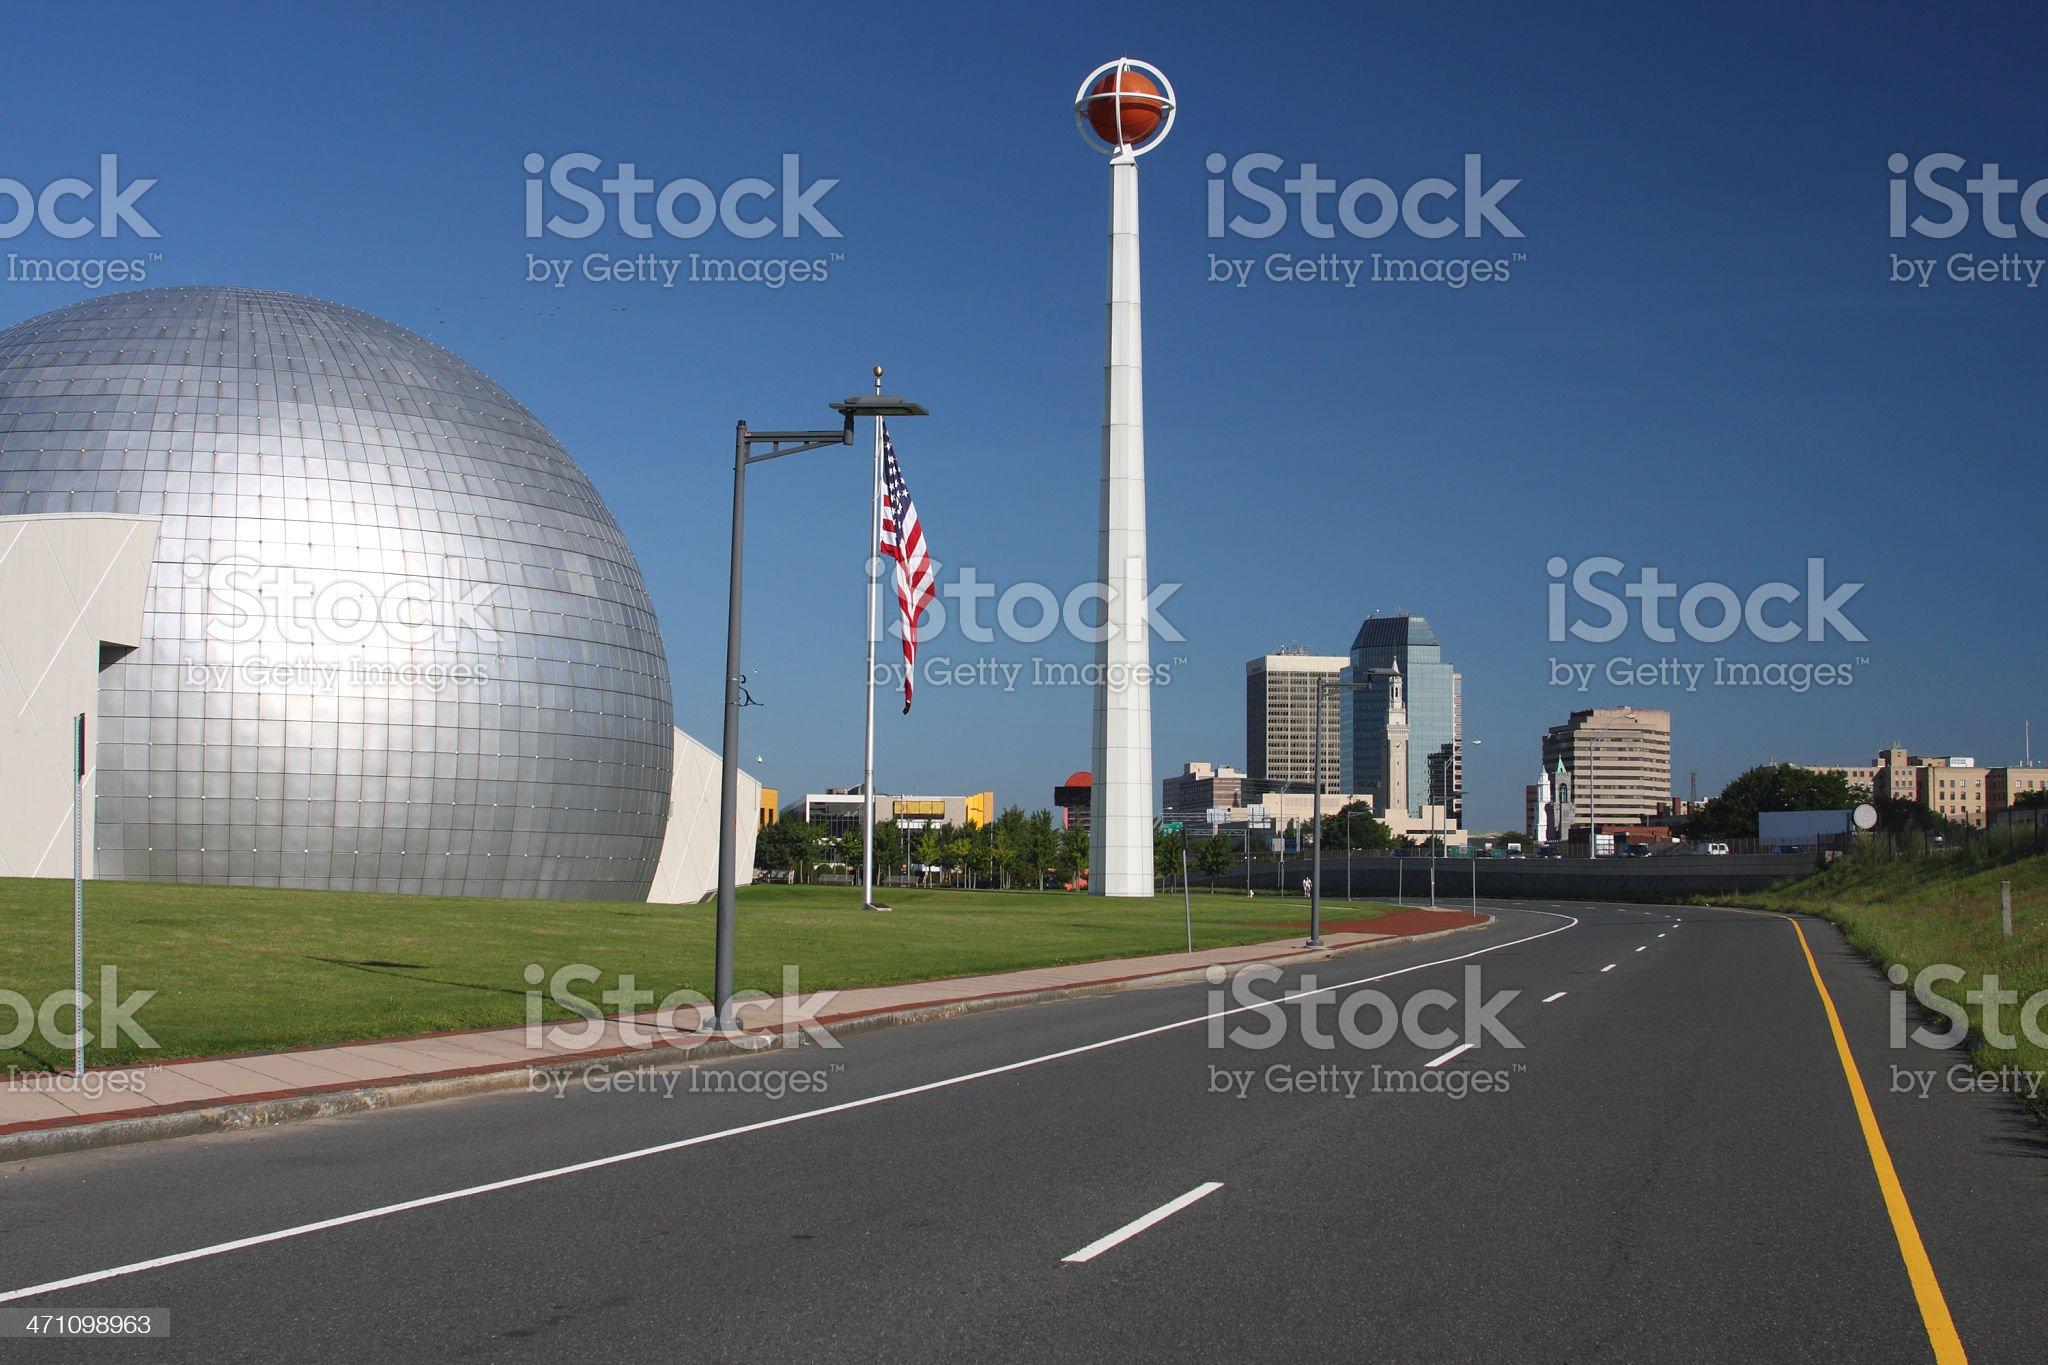 Basketball Hall of Fame royalty-free stock photo